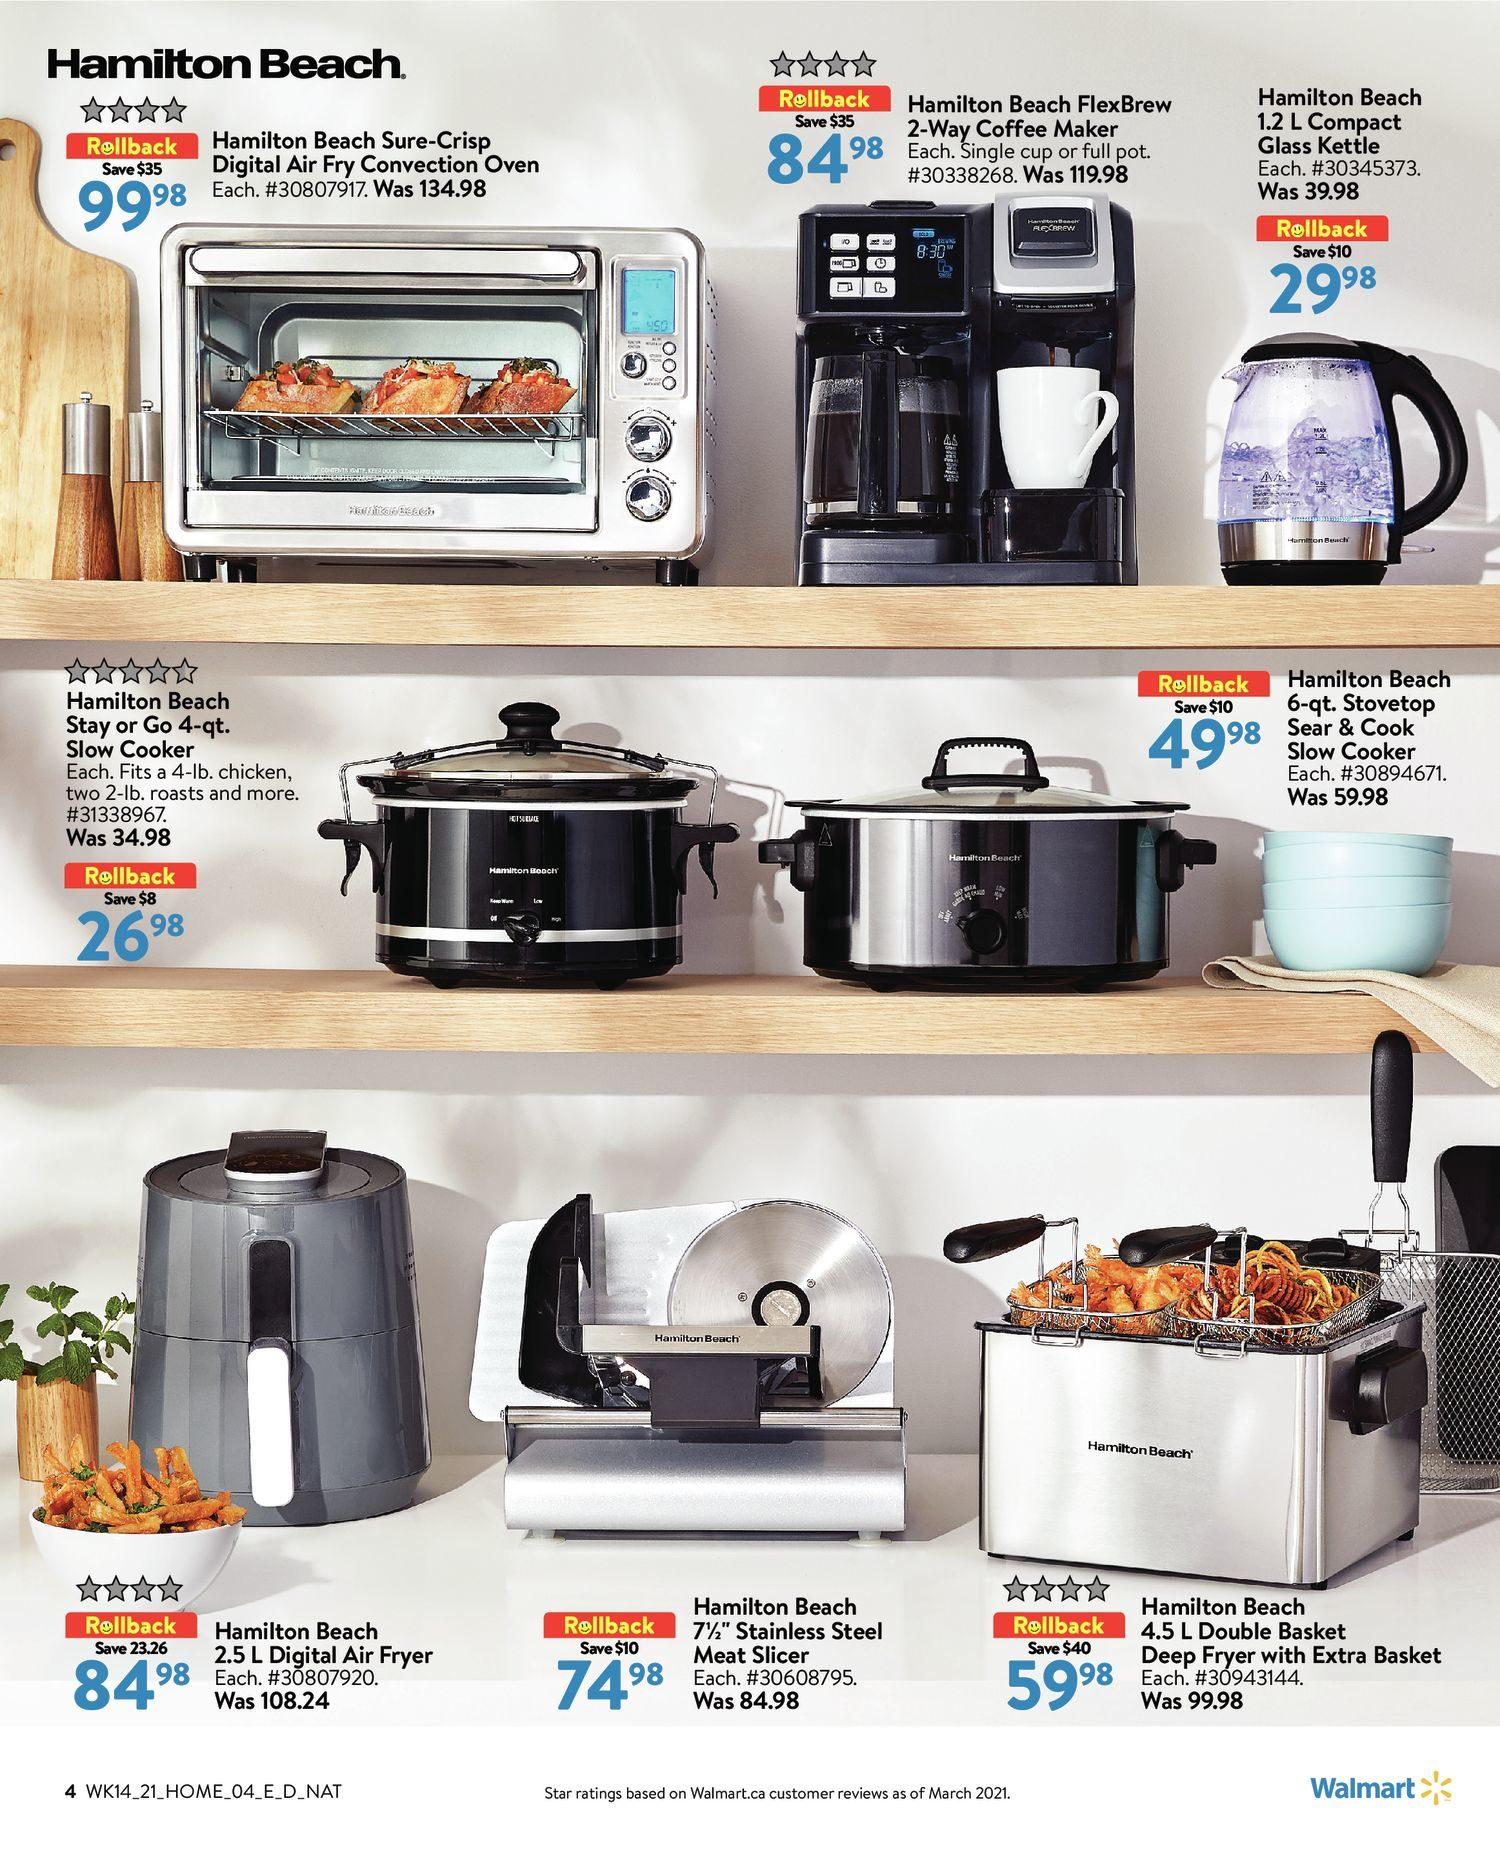 Walmart - Home Book - Page 4